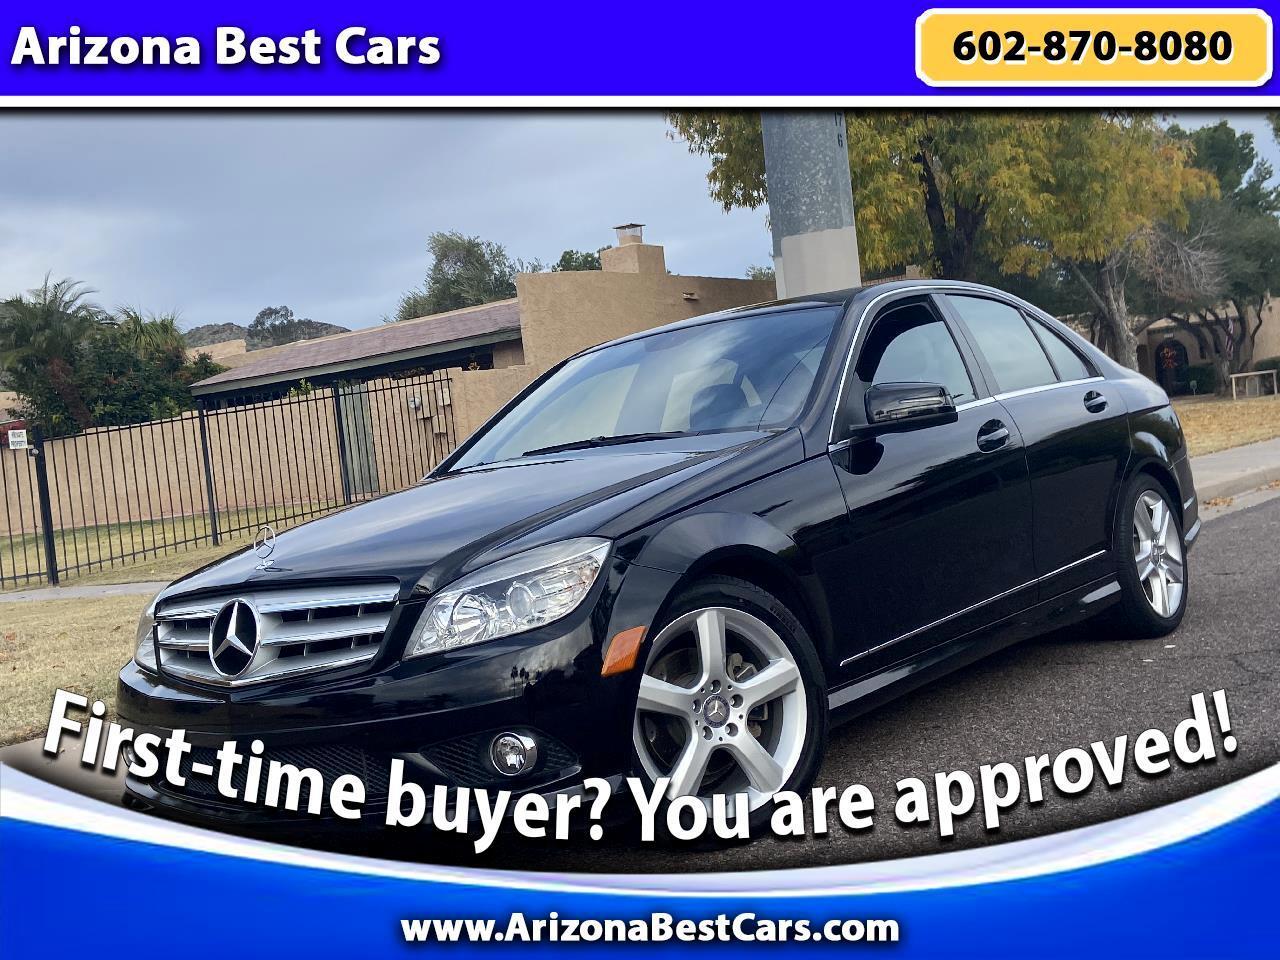 Cars For Sale In Arizona >> Used Cars For Sale Phoenix Az 85020 Arizona Best Cars